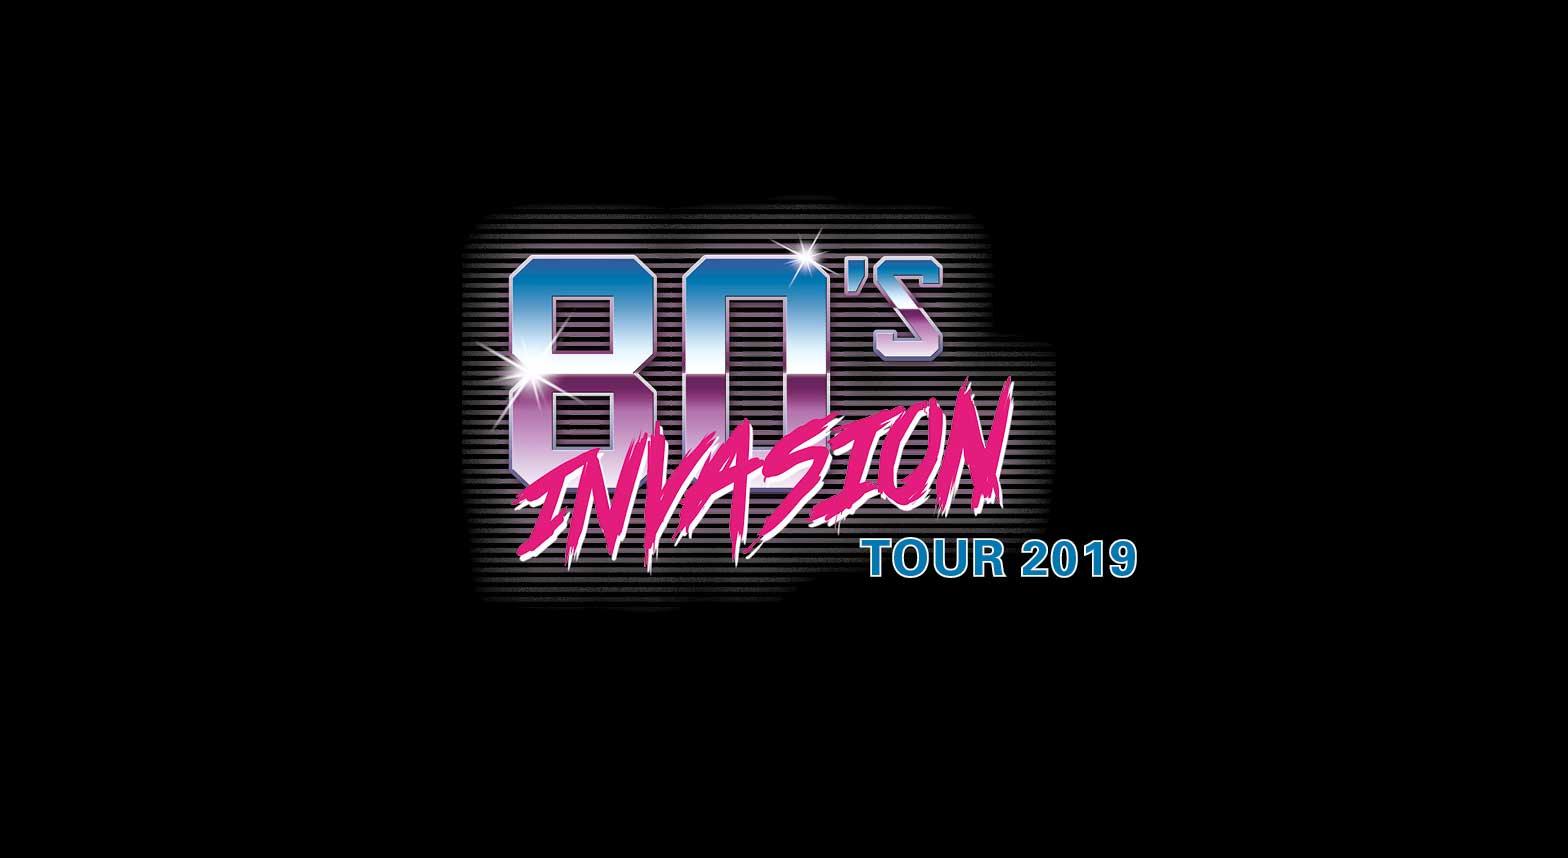 80s-invasion-arenas.jpg